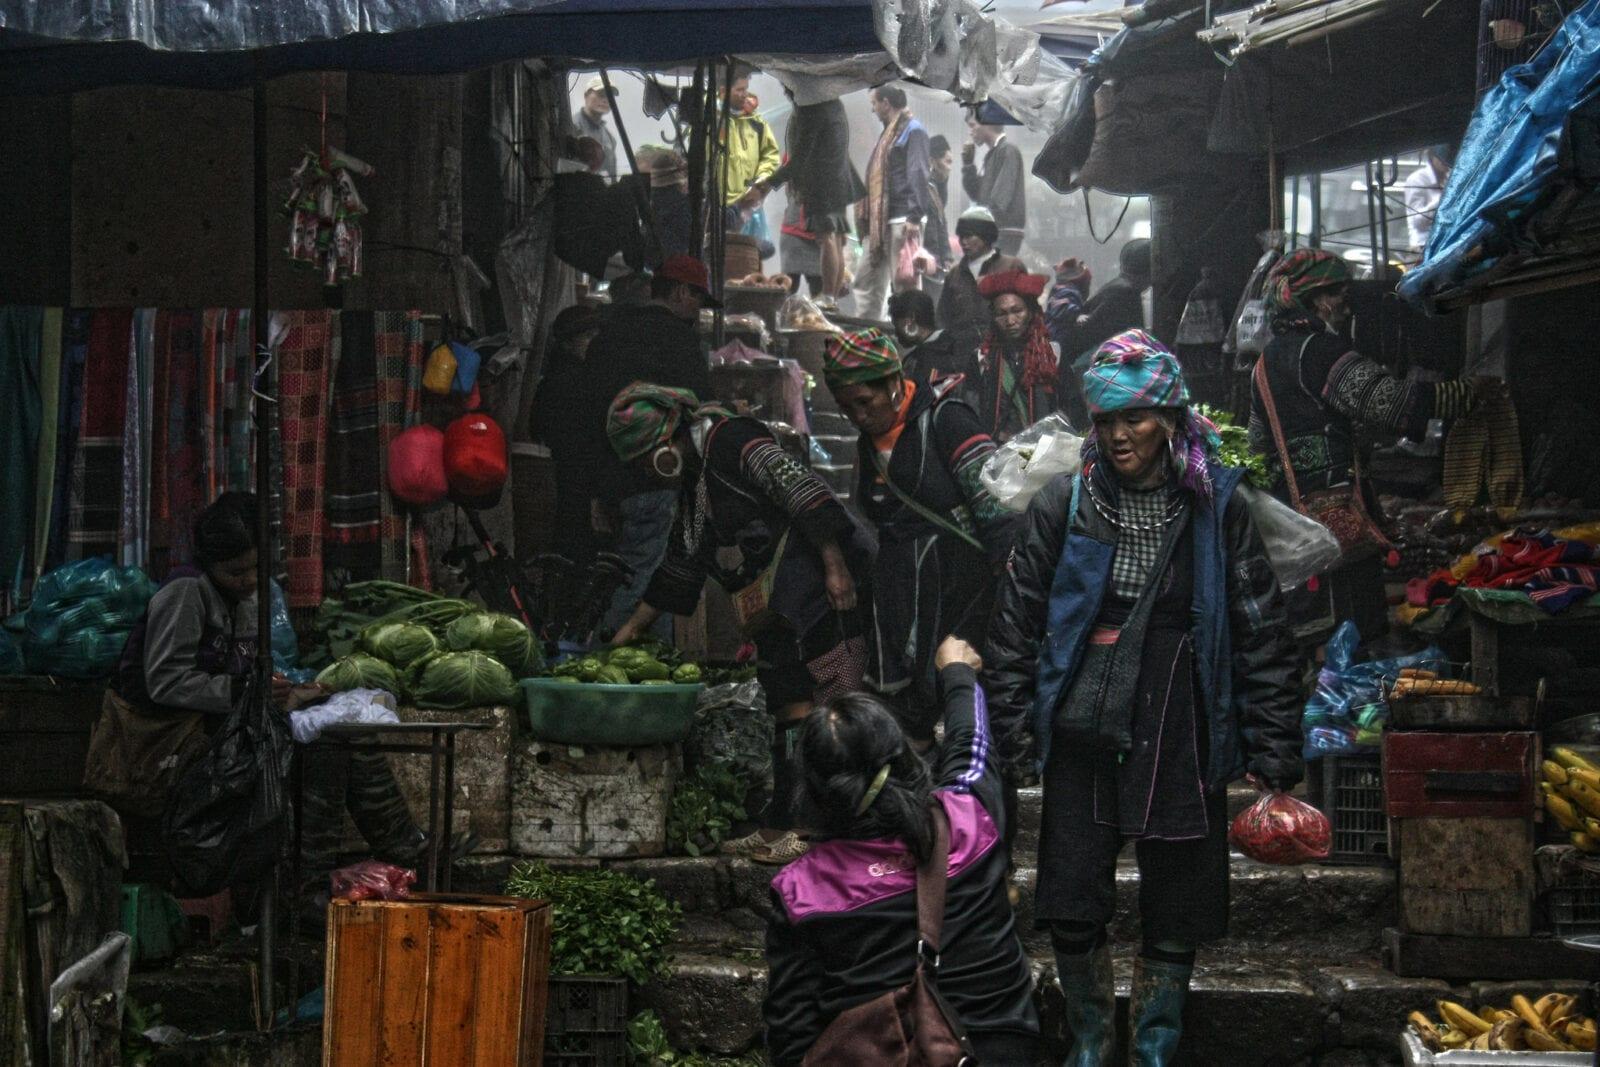 Image of a street market in Sapa, Vietnam